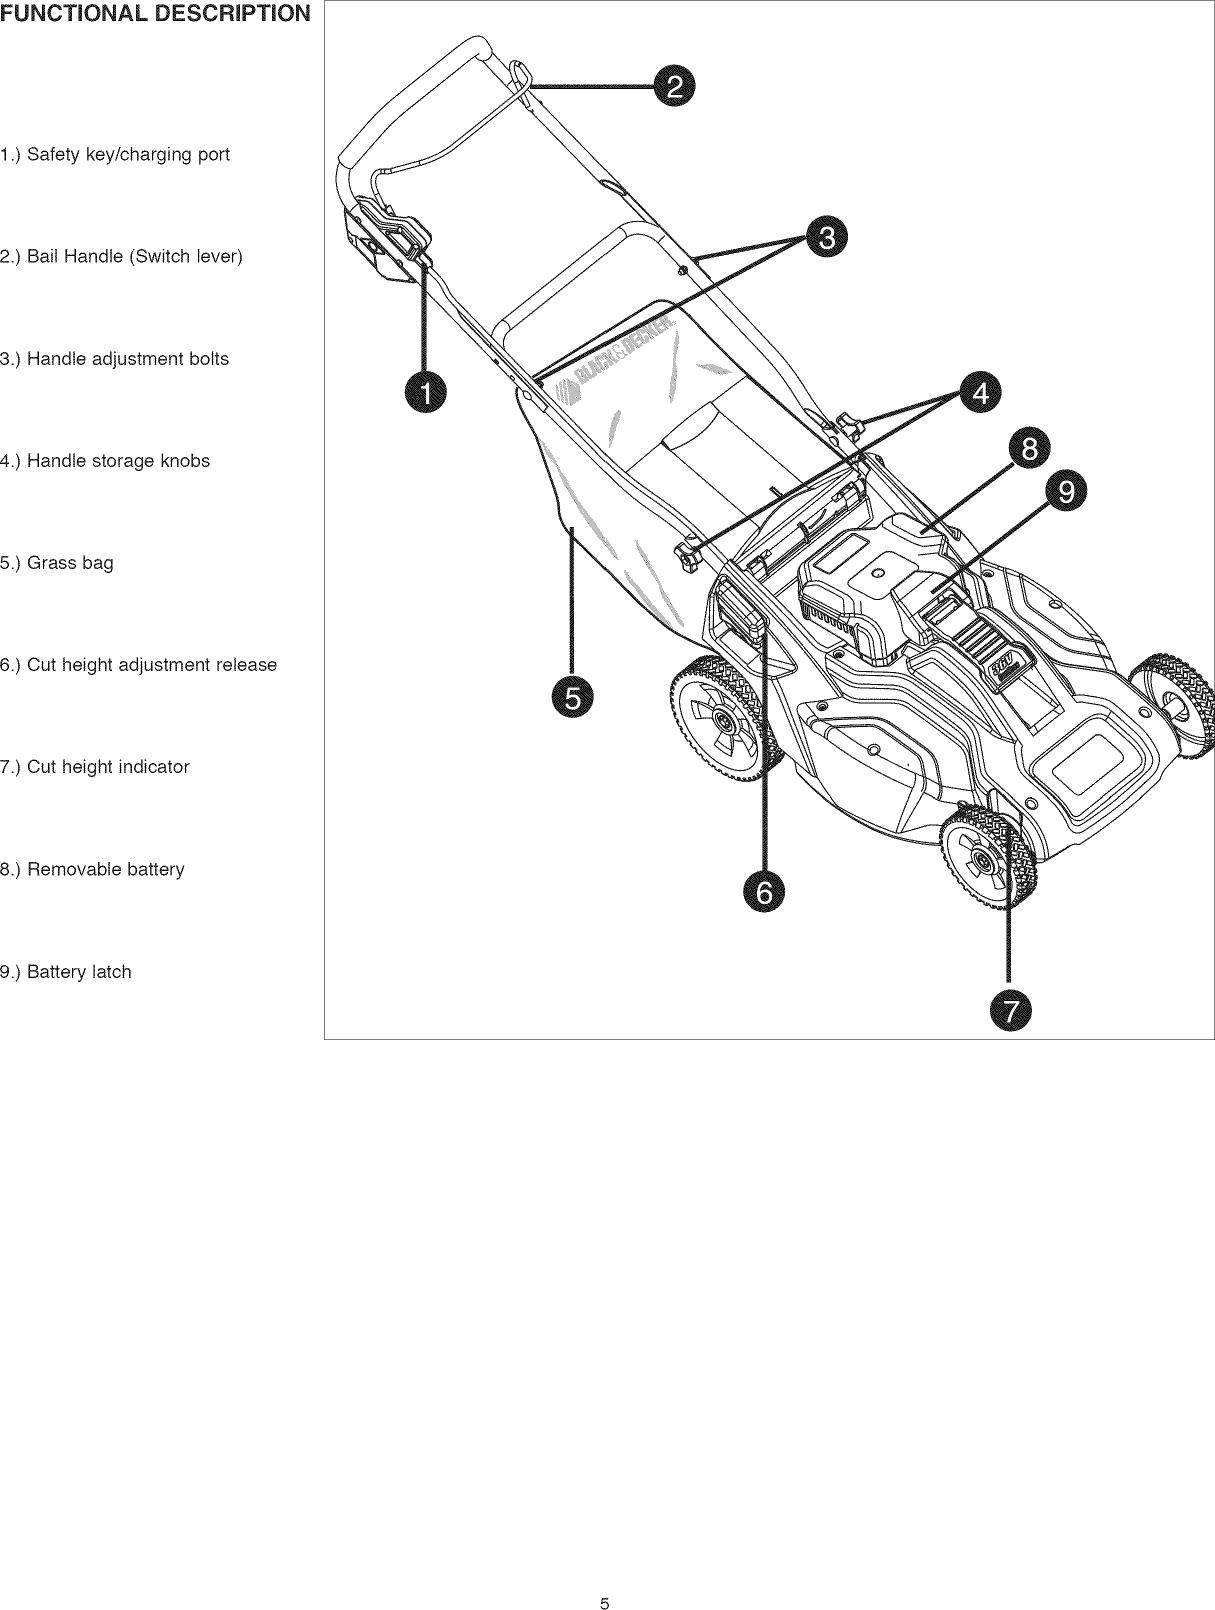 Black And Decker Lawn Mower Manual Pdf / Bdp2600 Type 2